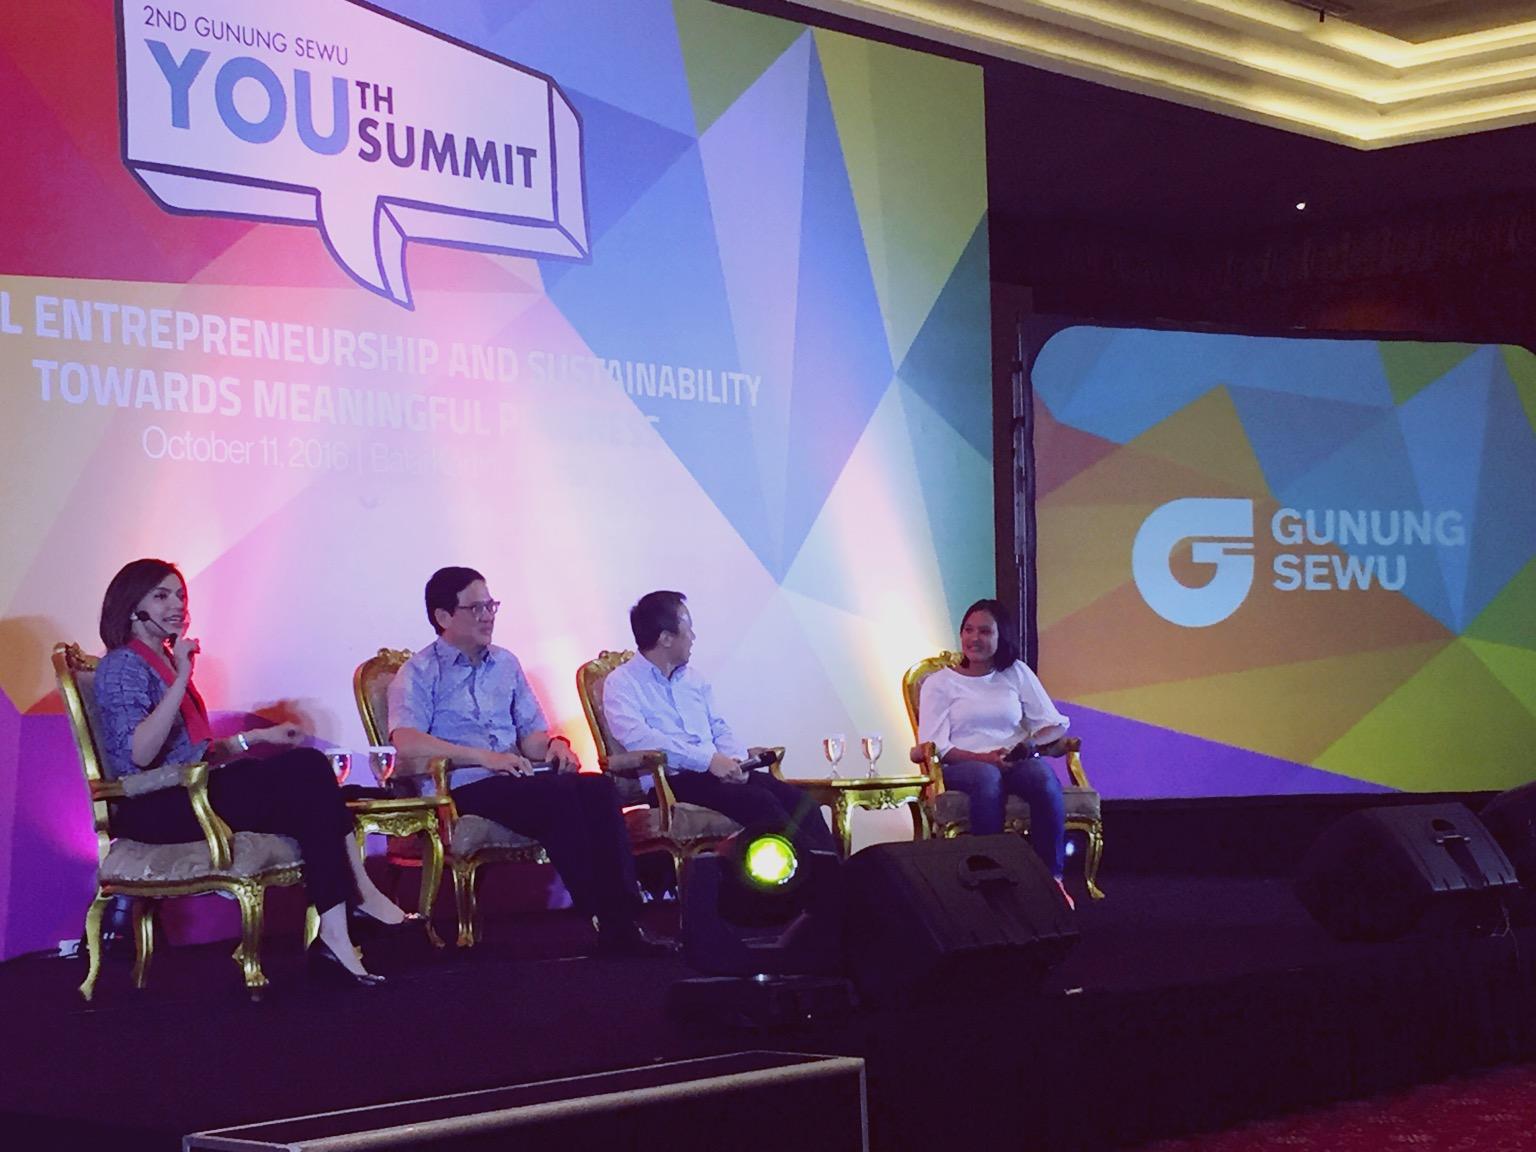 panel-youth-summit.jpg